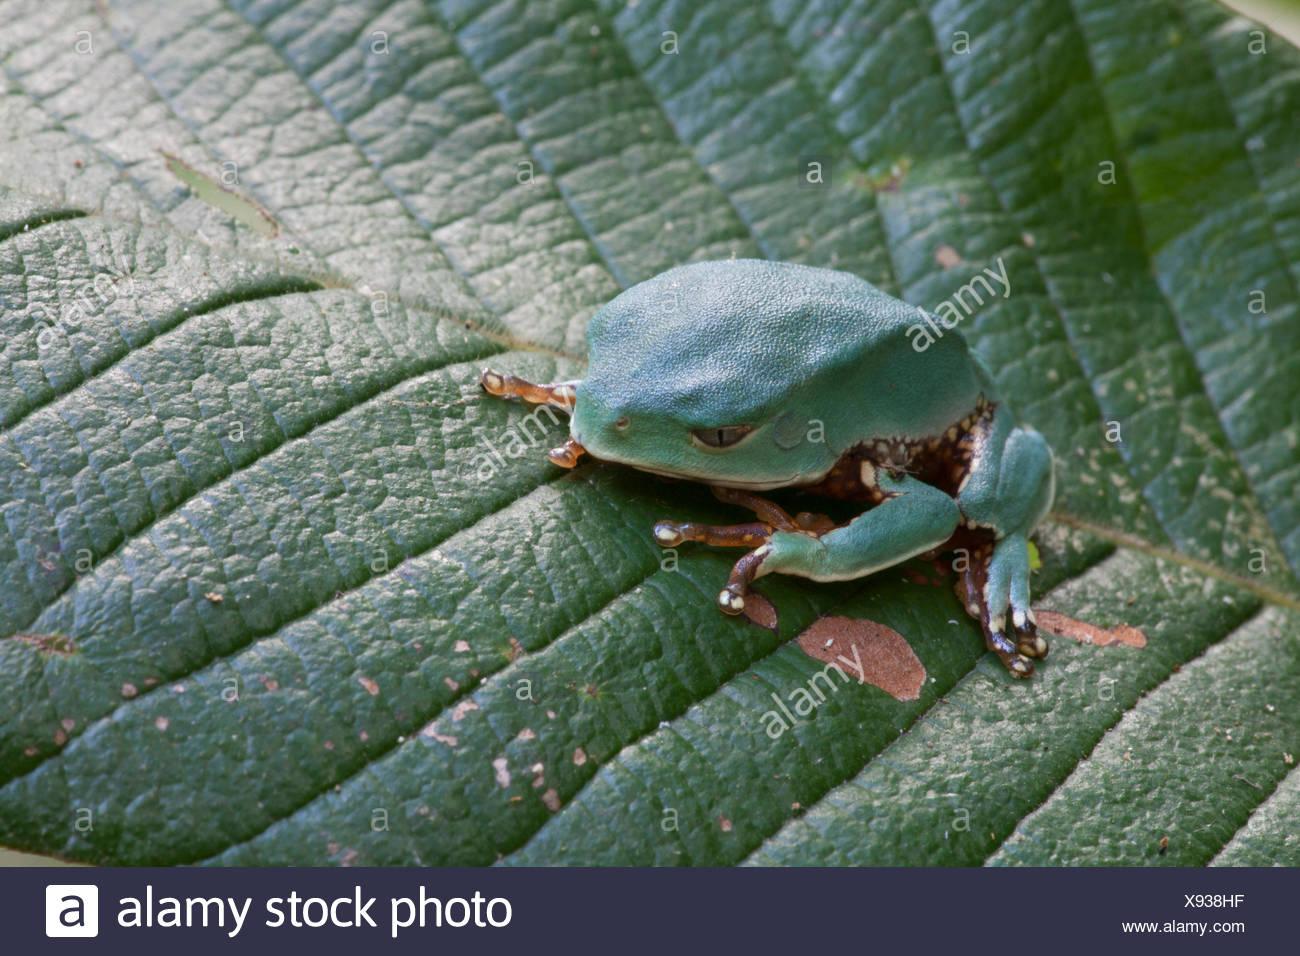 Ein Affe Frosch, Phyllomedusa Arten auf ein Blatt im Amazonas Regenwald. Stockbild